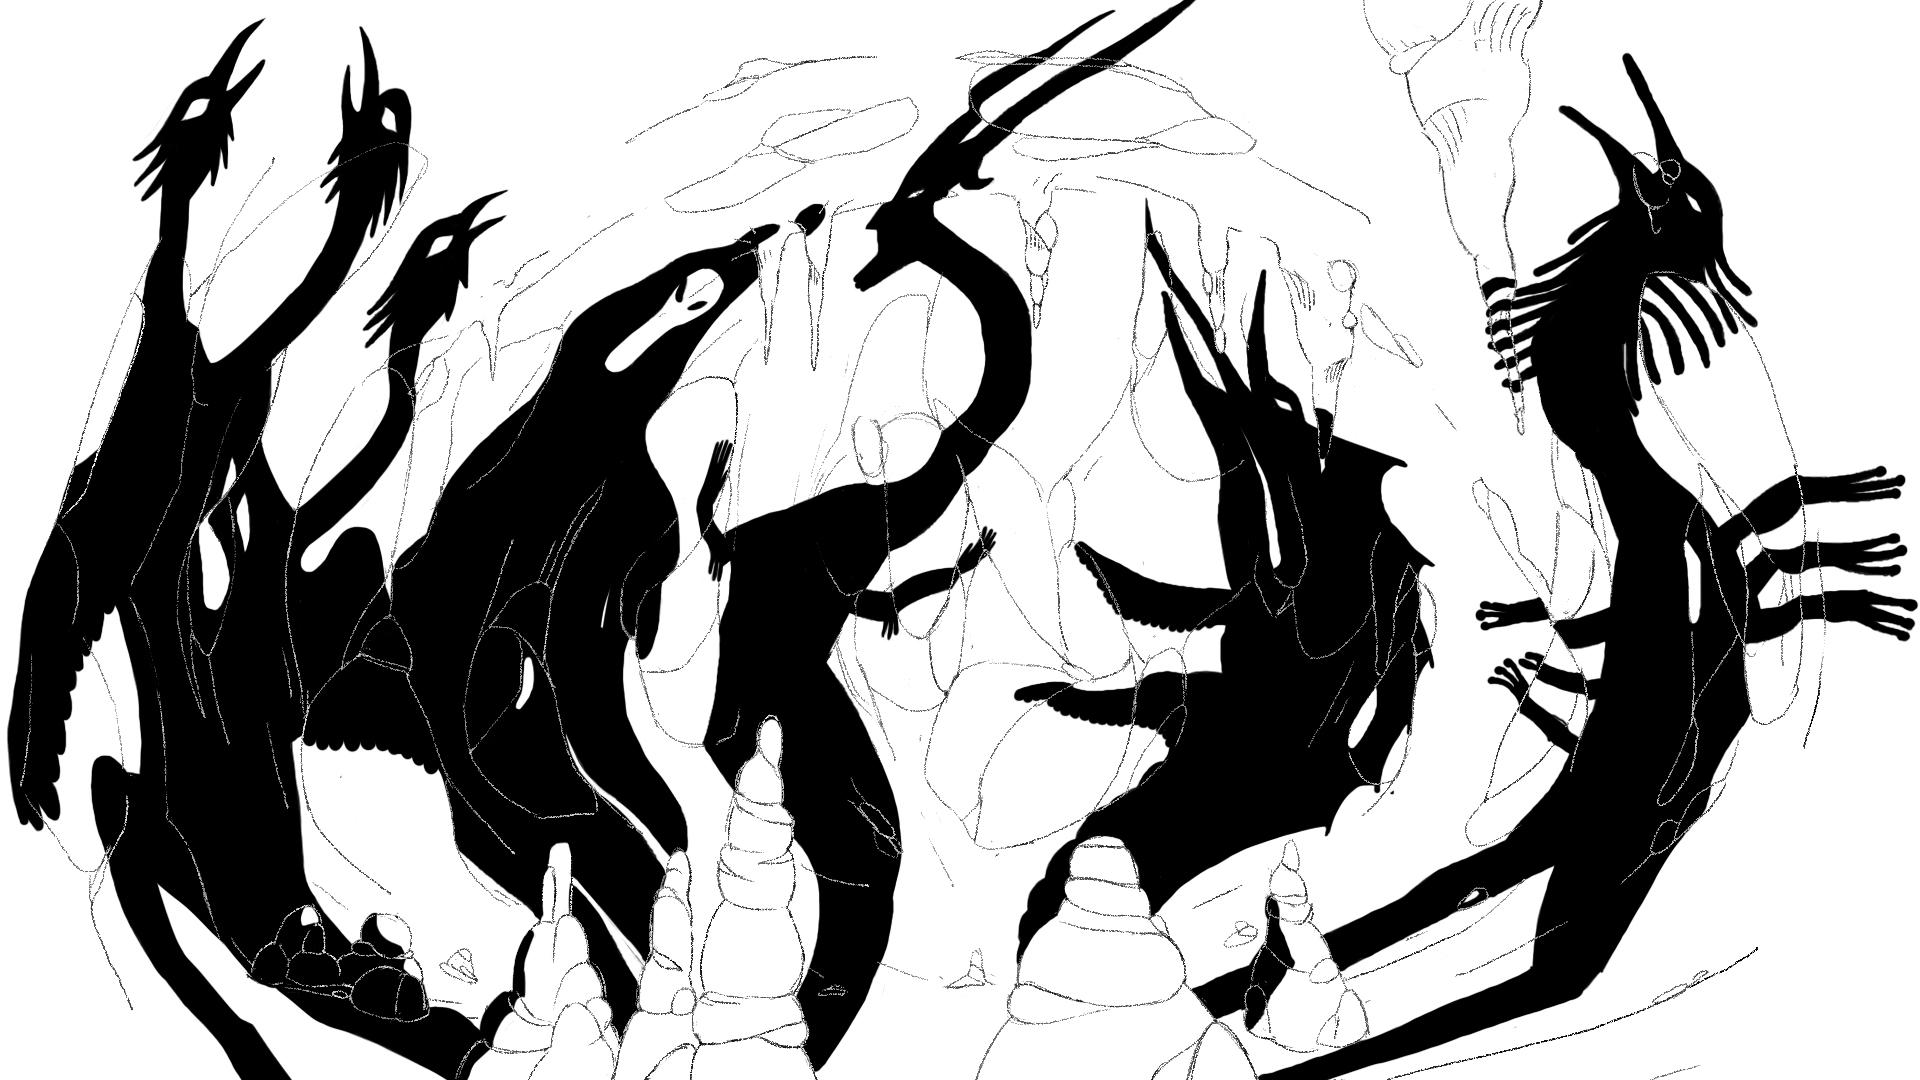 DAV170_Cave_creatures.jpg